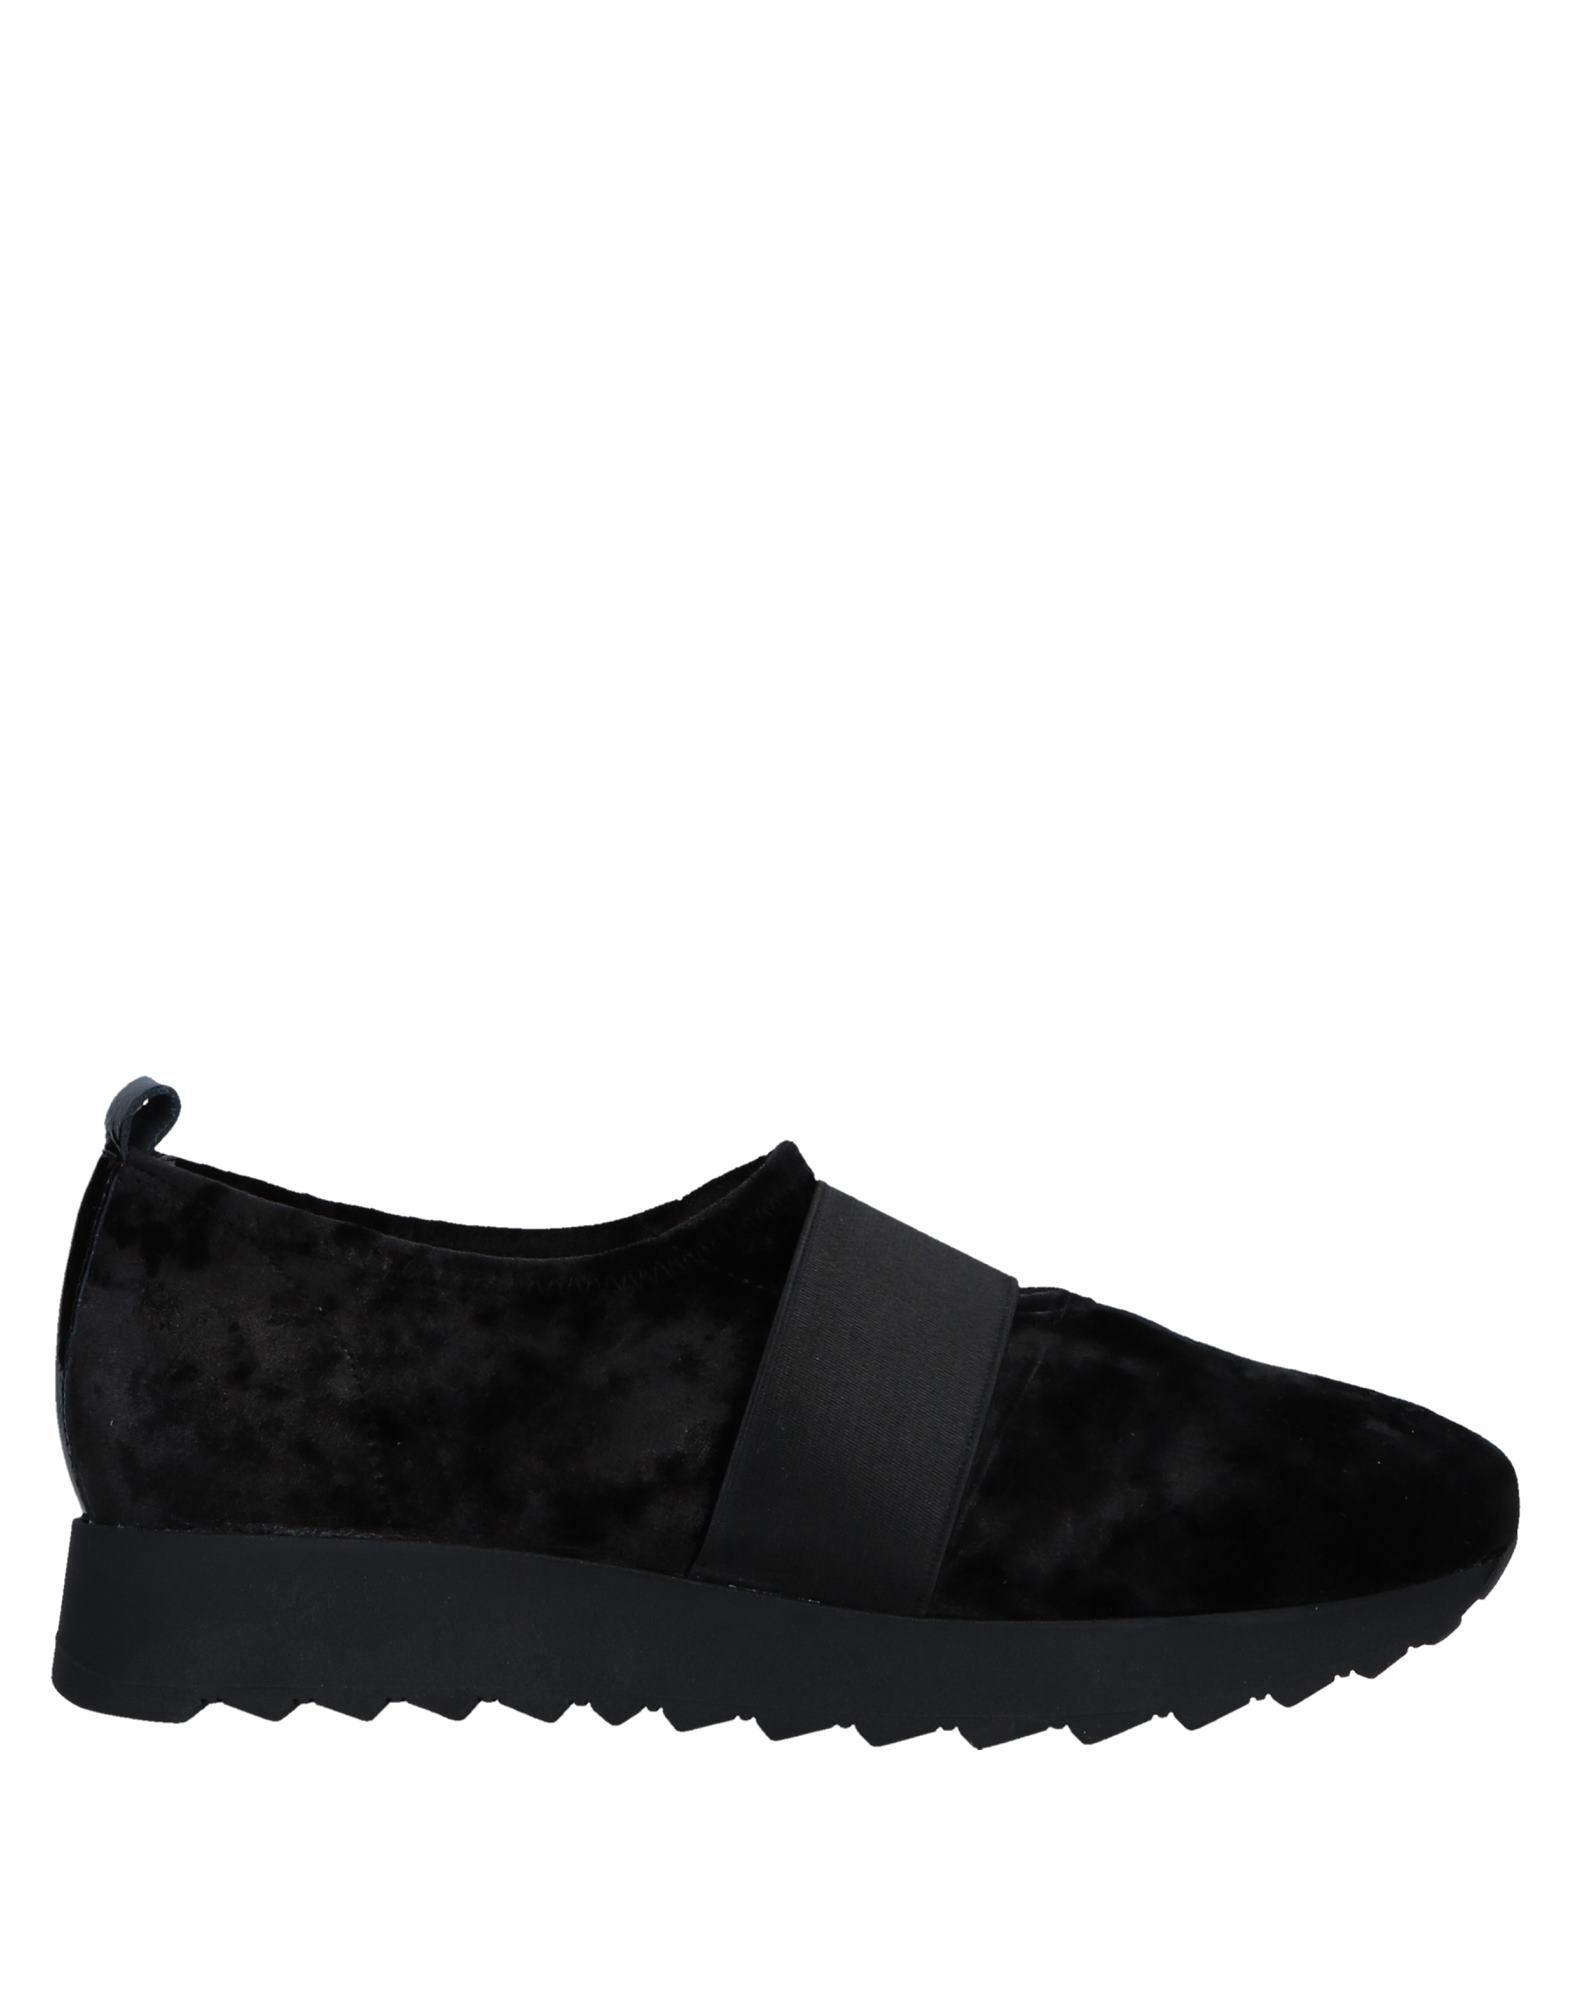 Toni Pons Sneakers Damen  11517246OJ